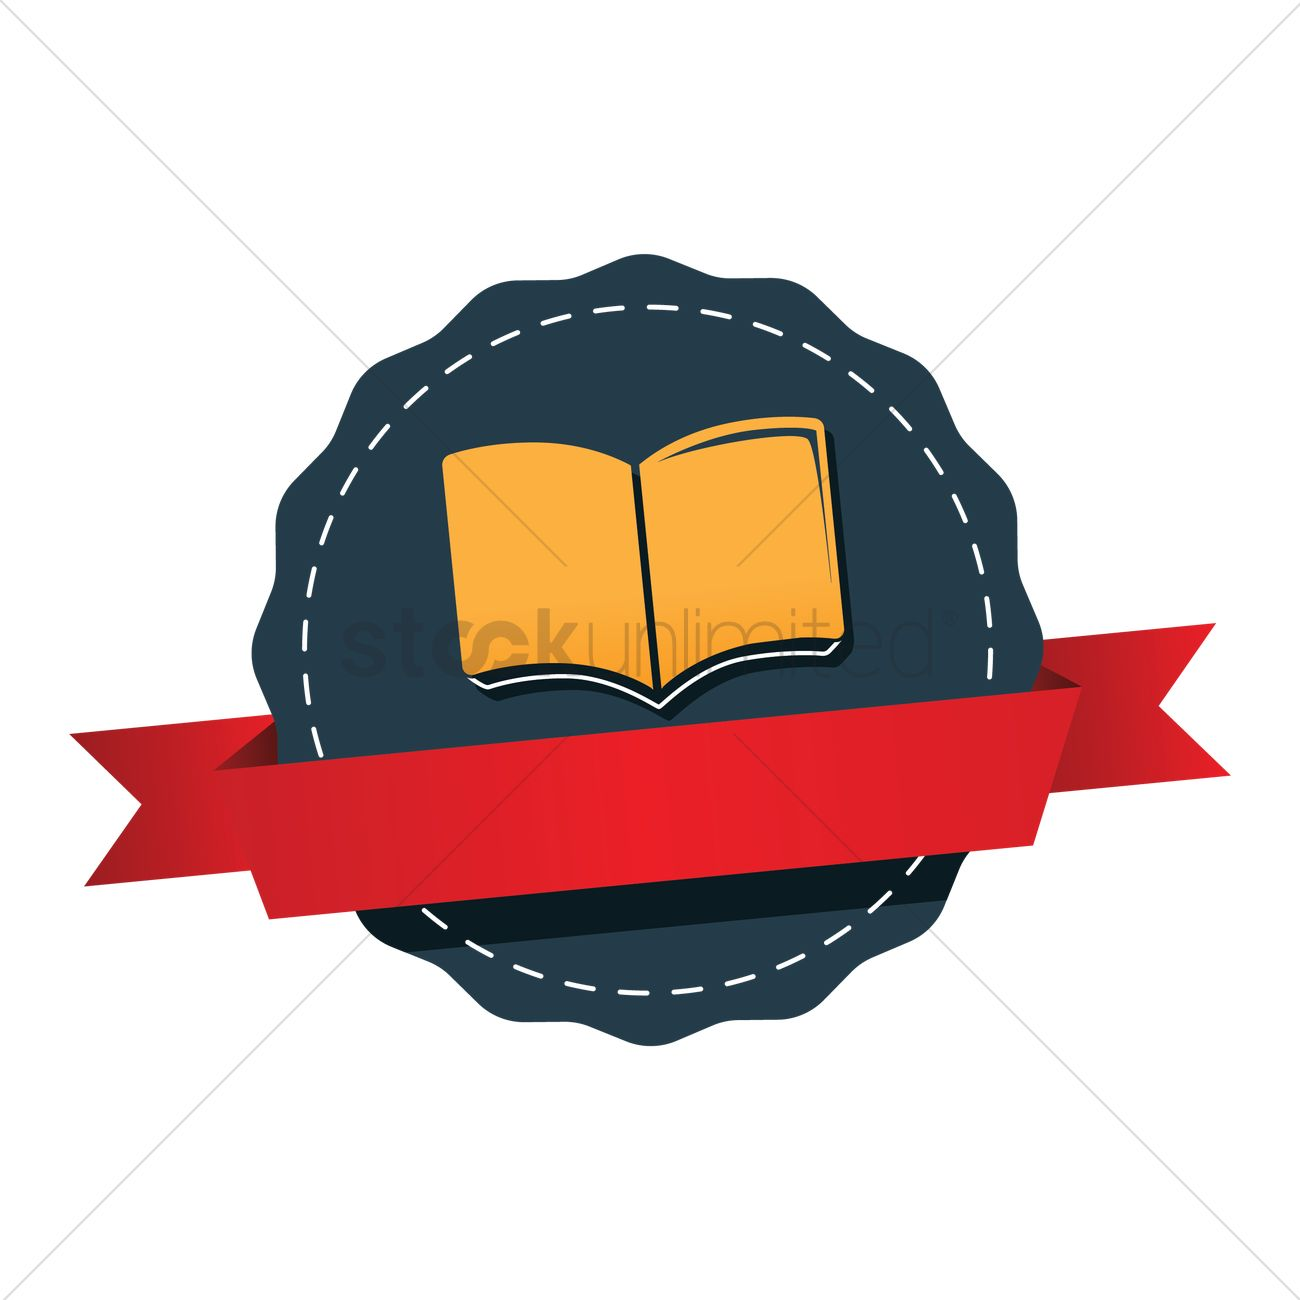 education logo design vector image 1969754 stockunlimited